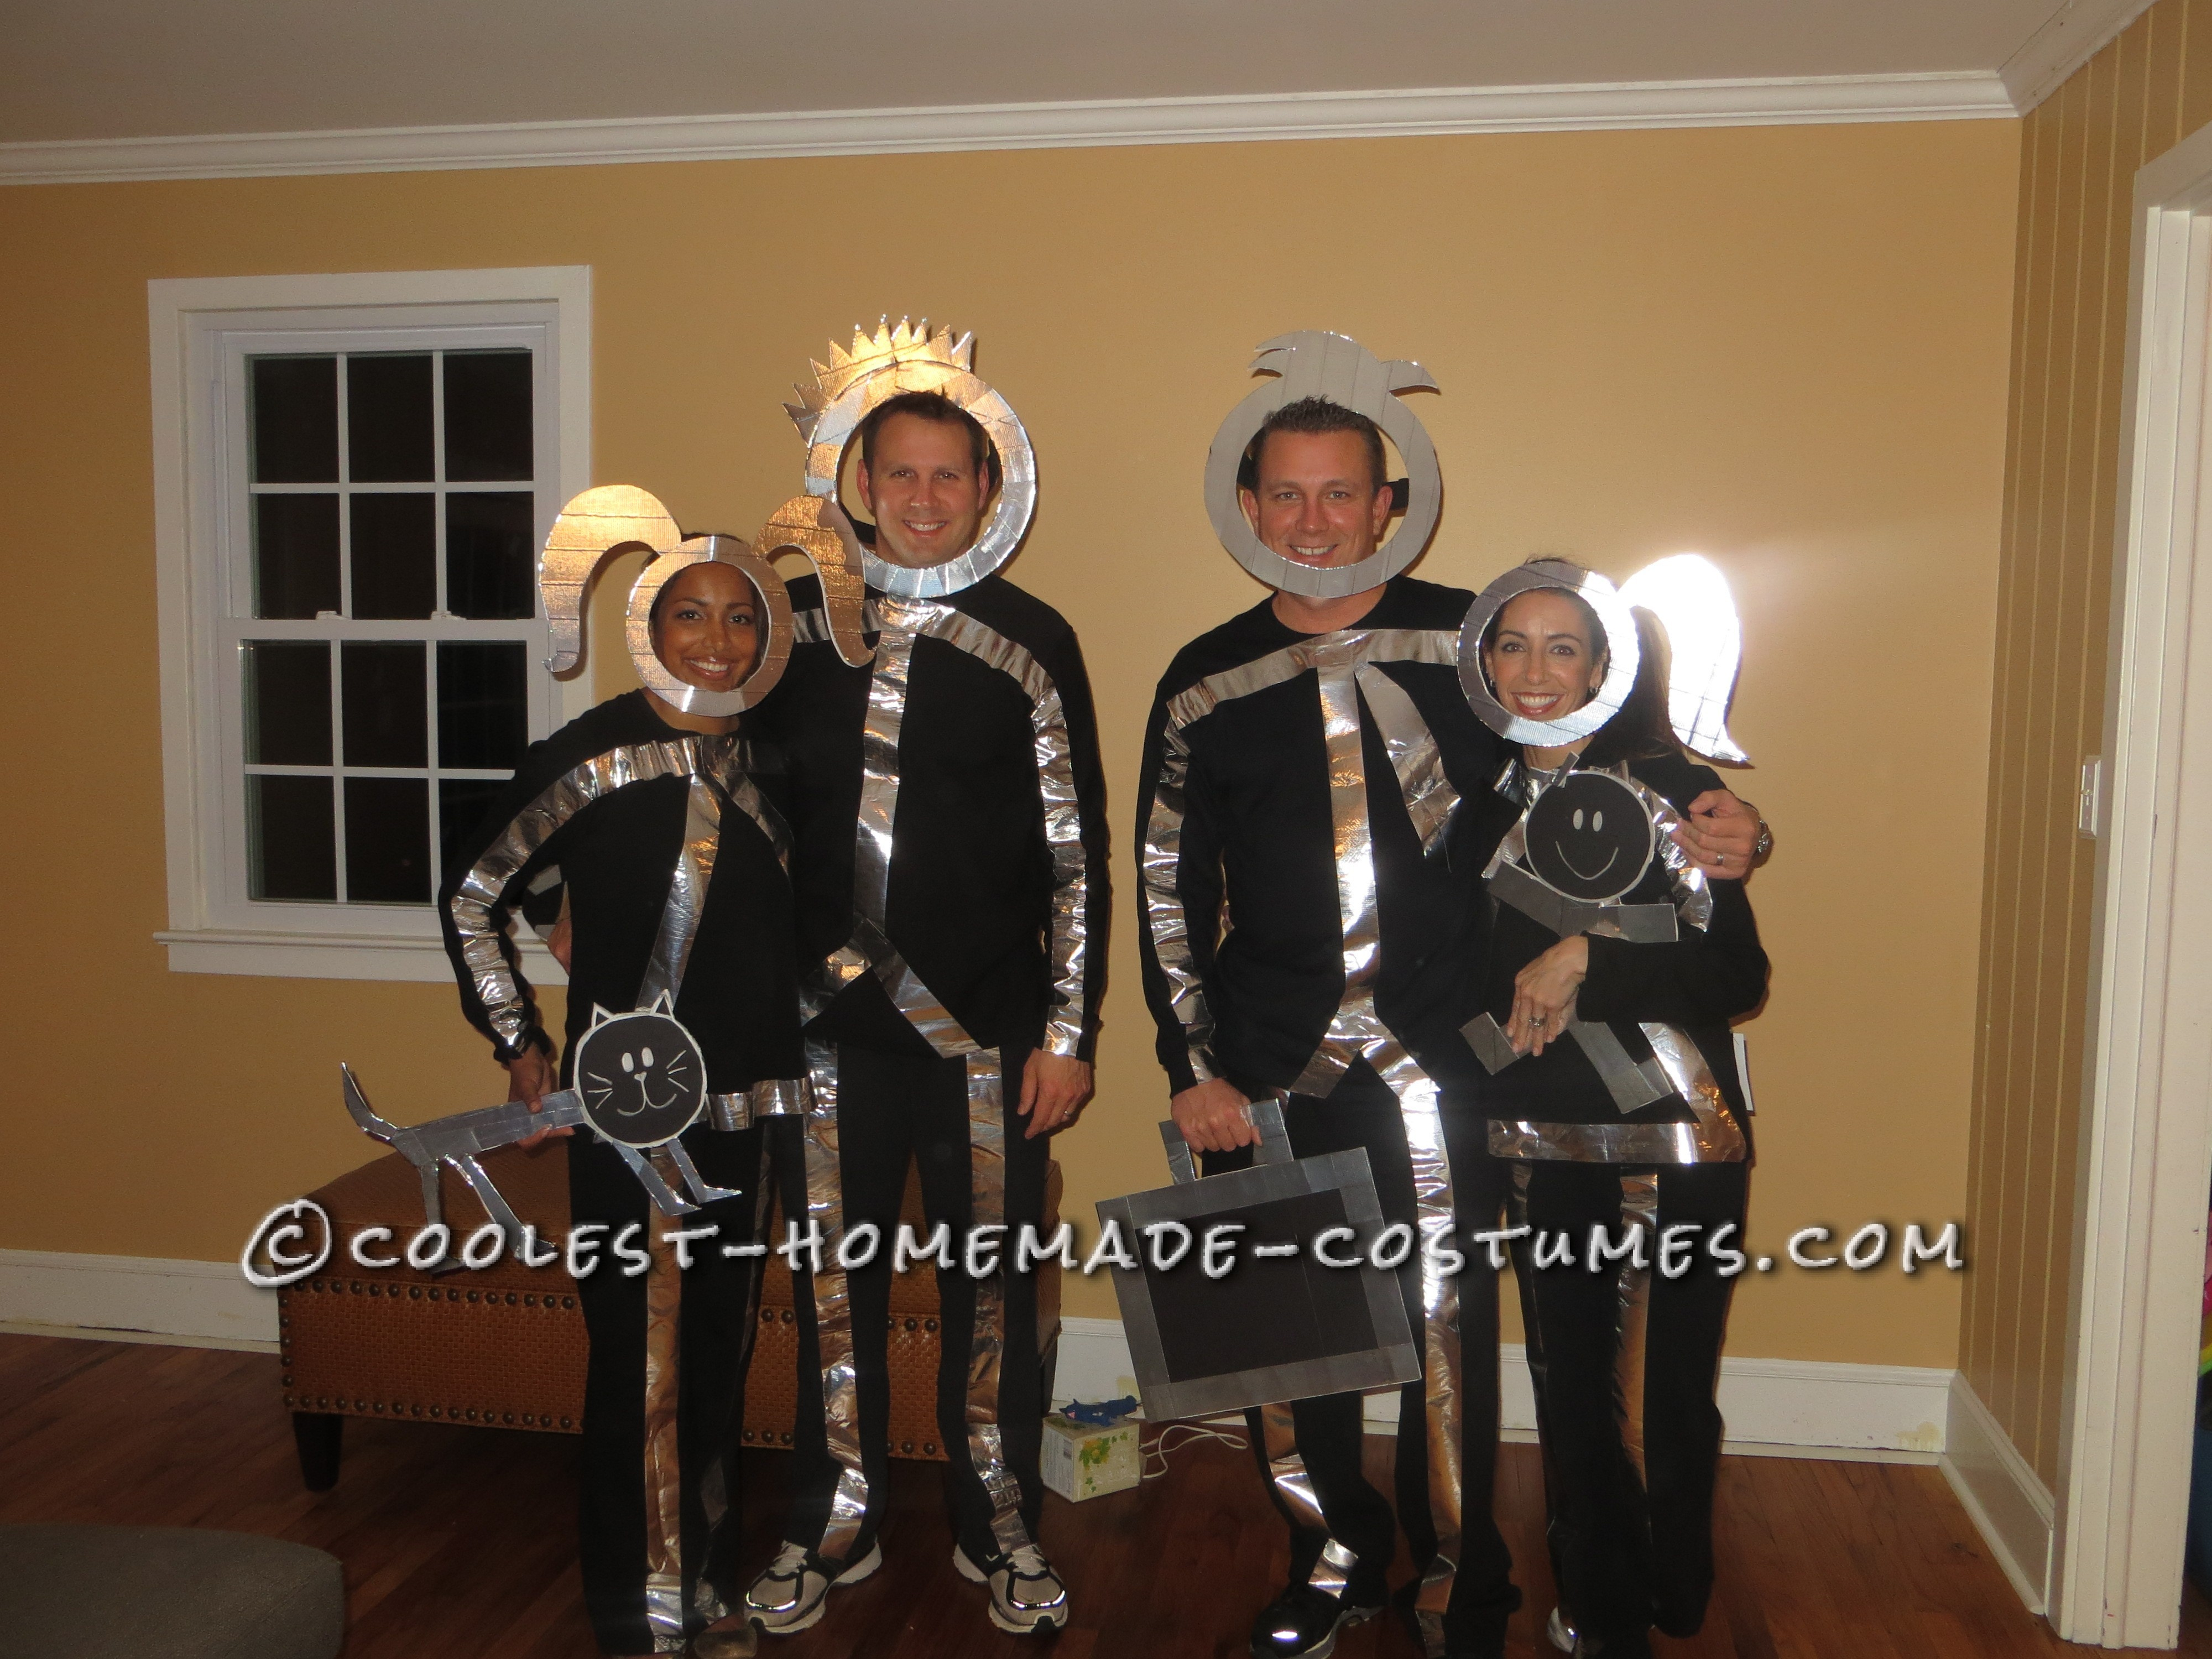 Easy and Original Group Costume Idea: Minivan Stick Figure Family Costume